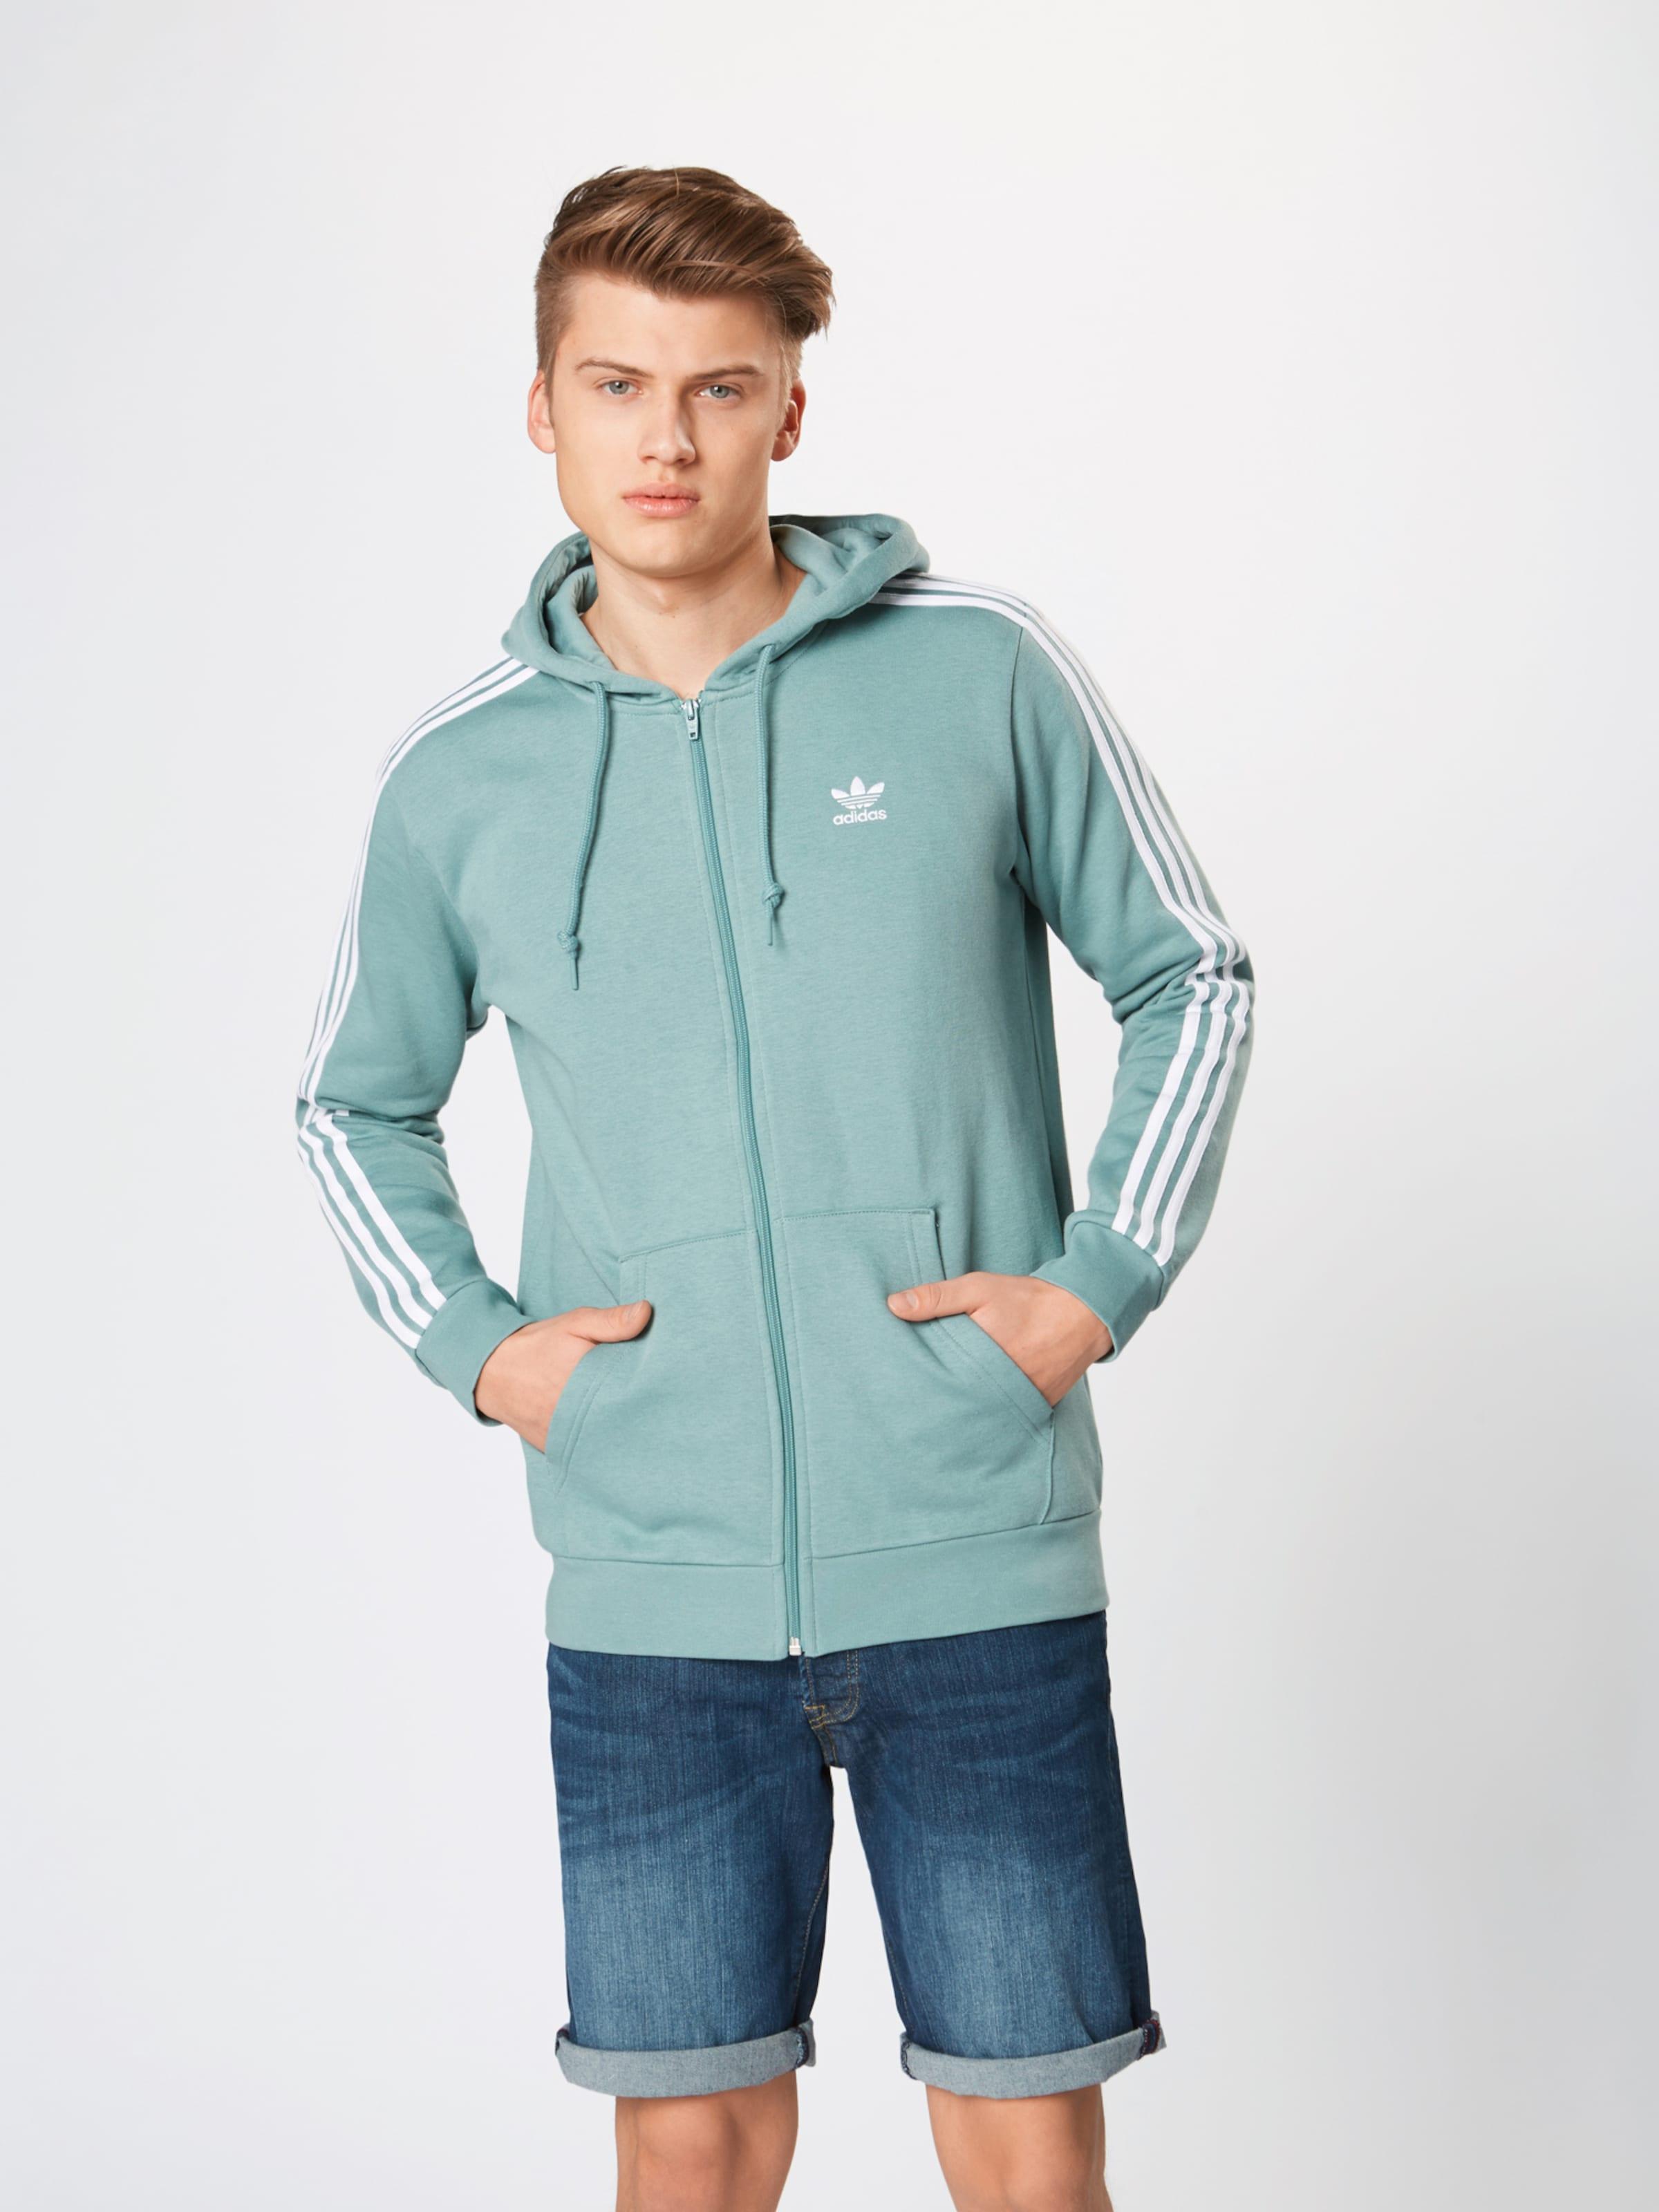 stripes Adidas In Sweatjacke MintWeiß Fz' Originals '3 TKJ53ulF1c